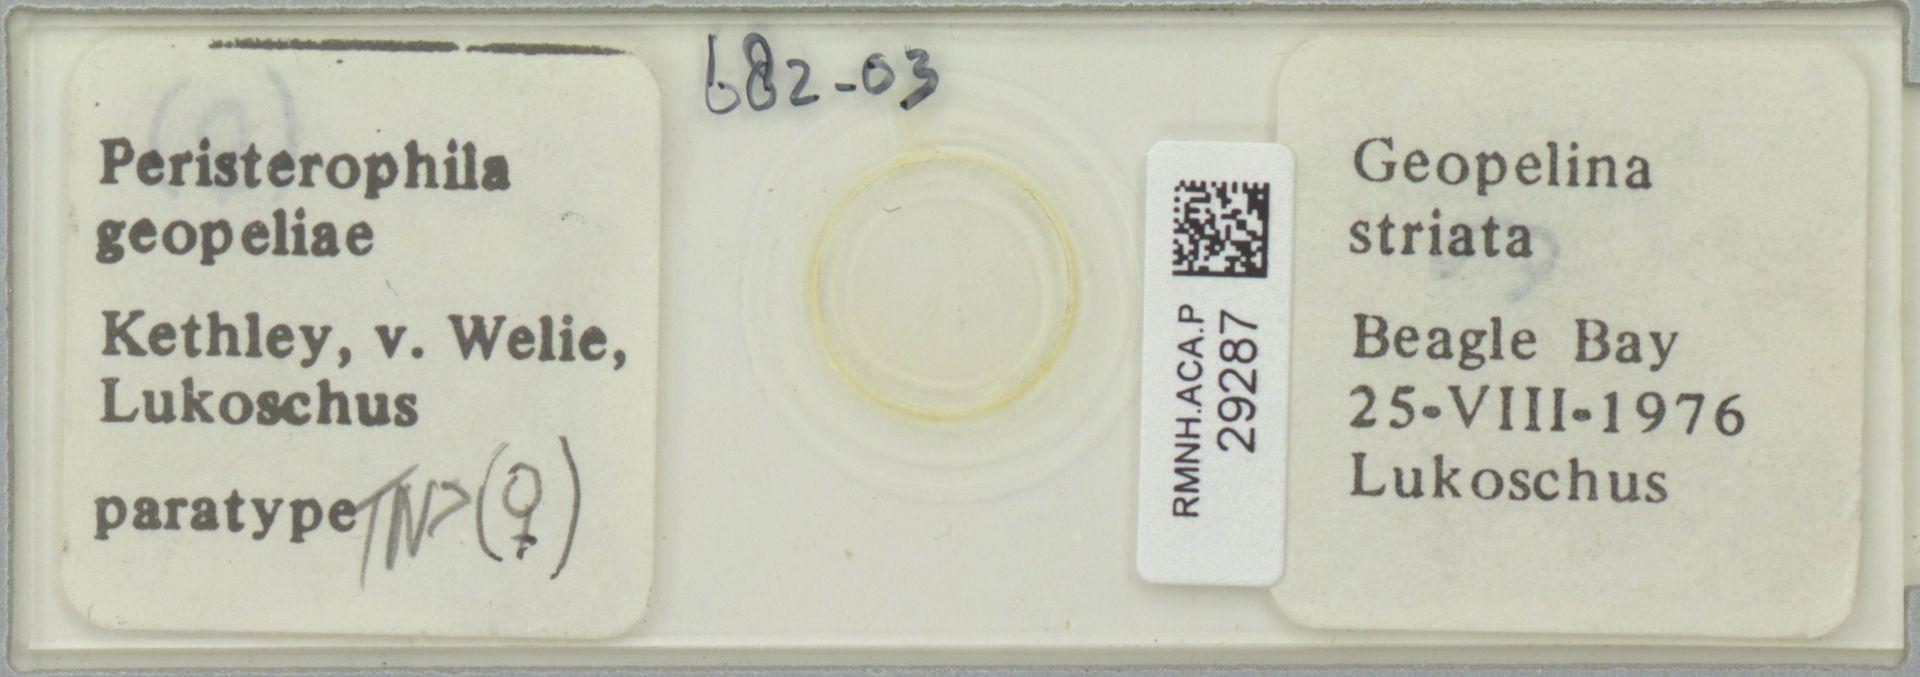 RMNH.ACA.P.29287 | Peristerophila geopeliae Kethley, v. Welie, Lukoschus